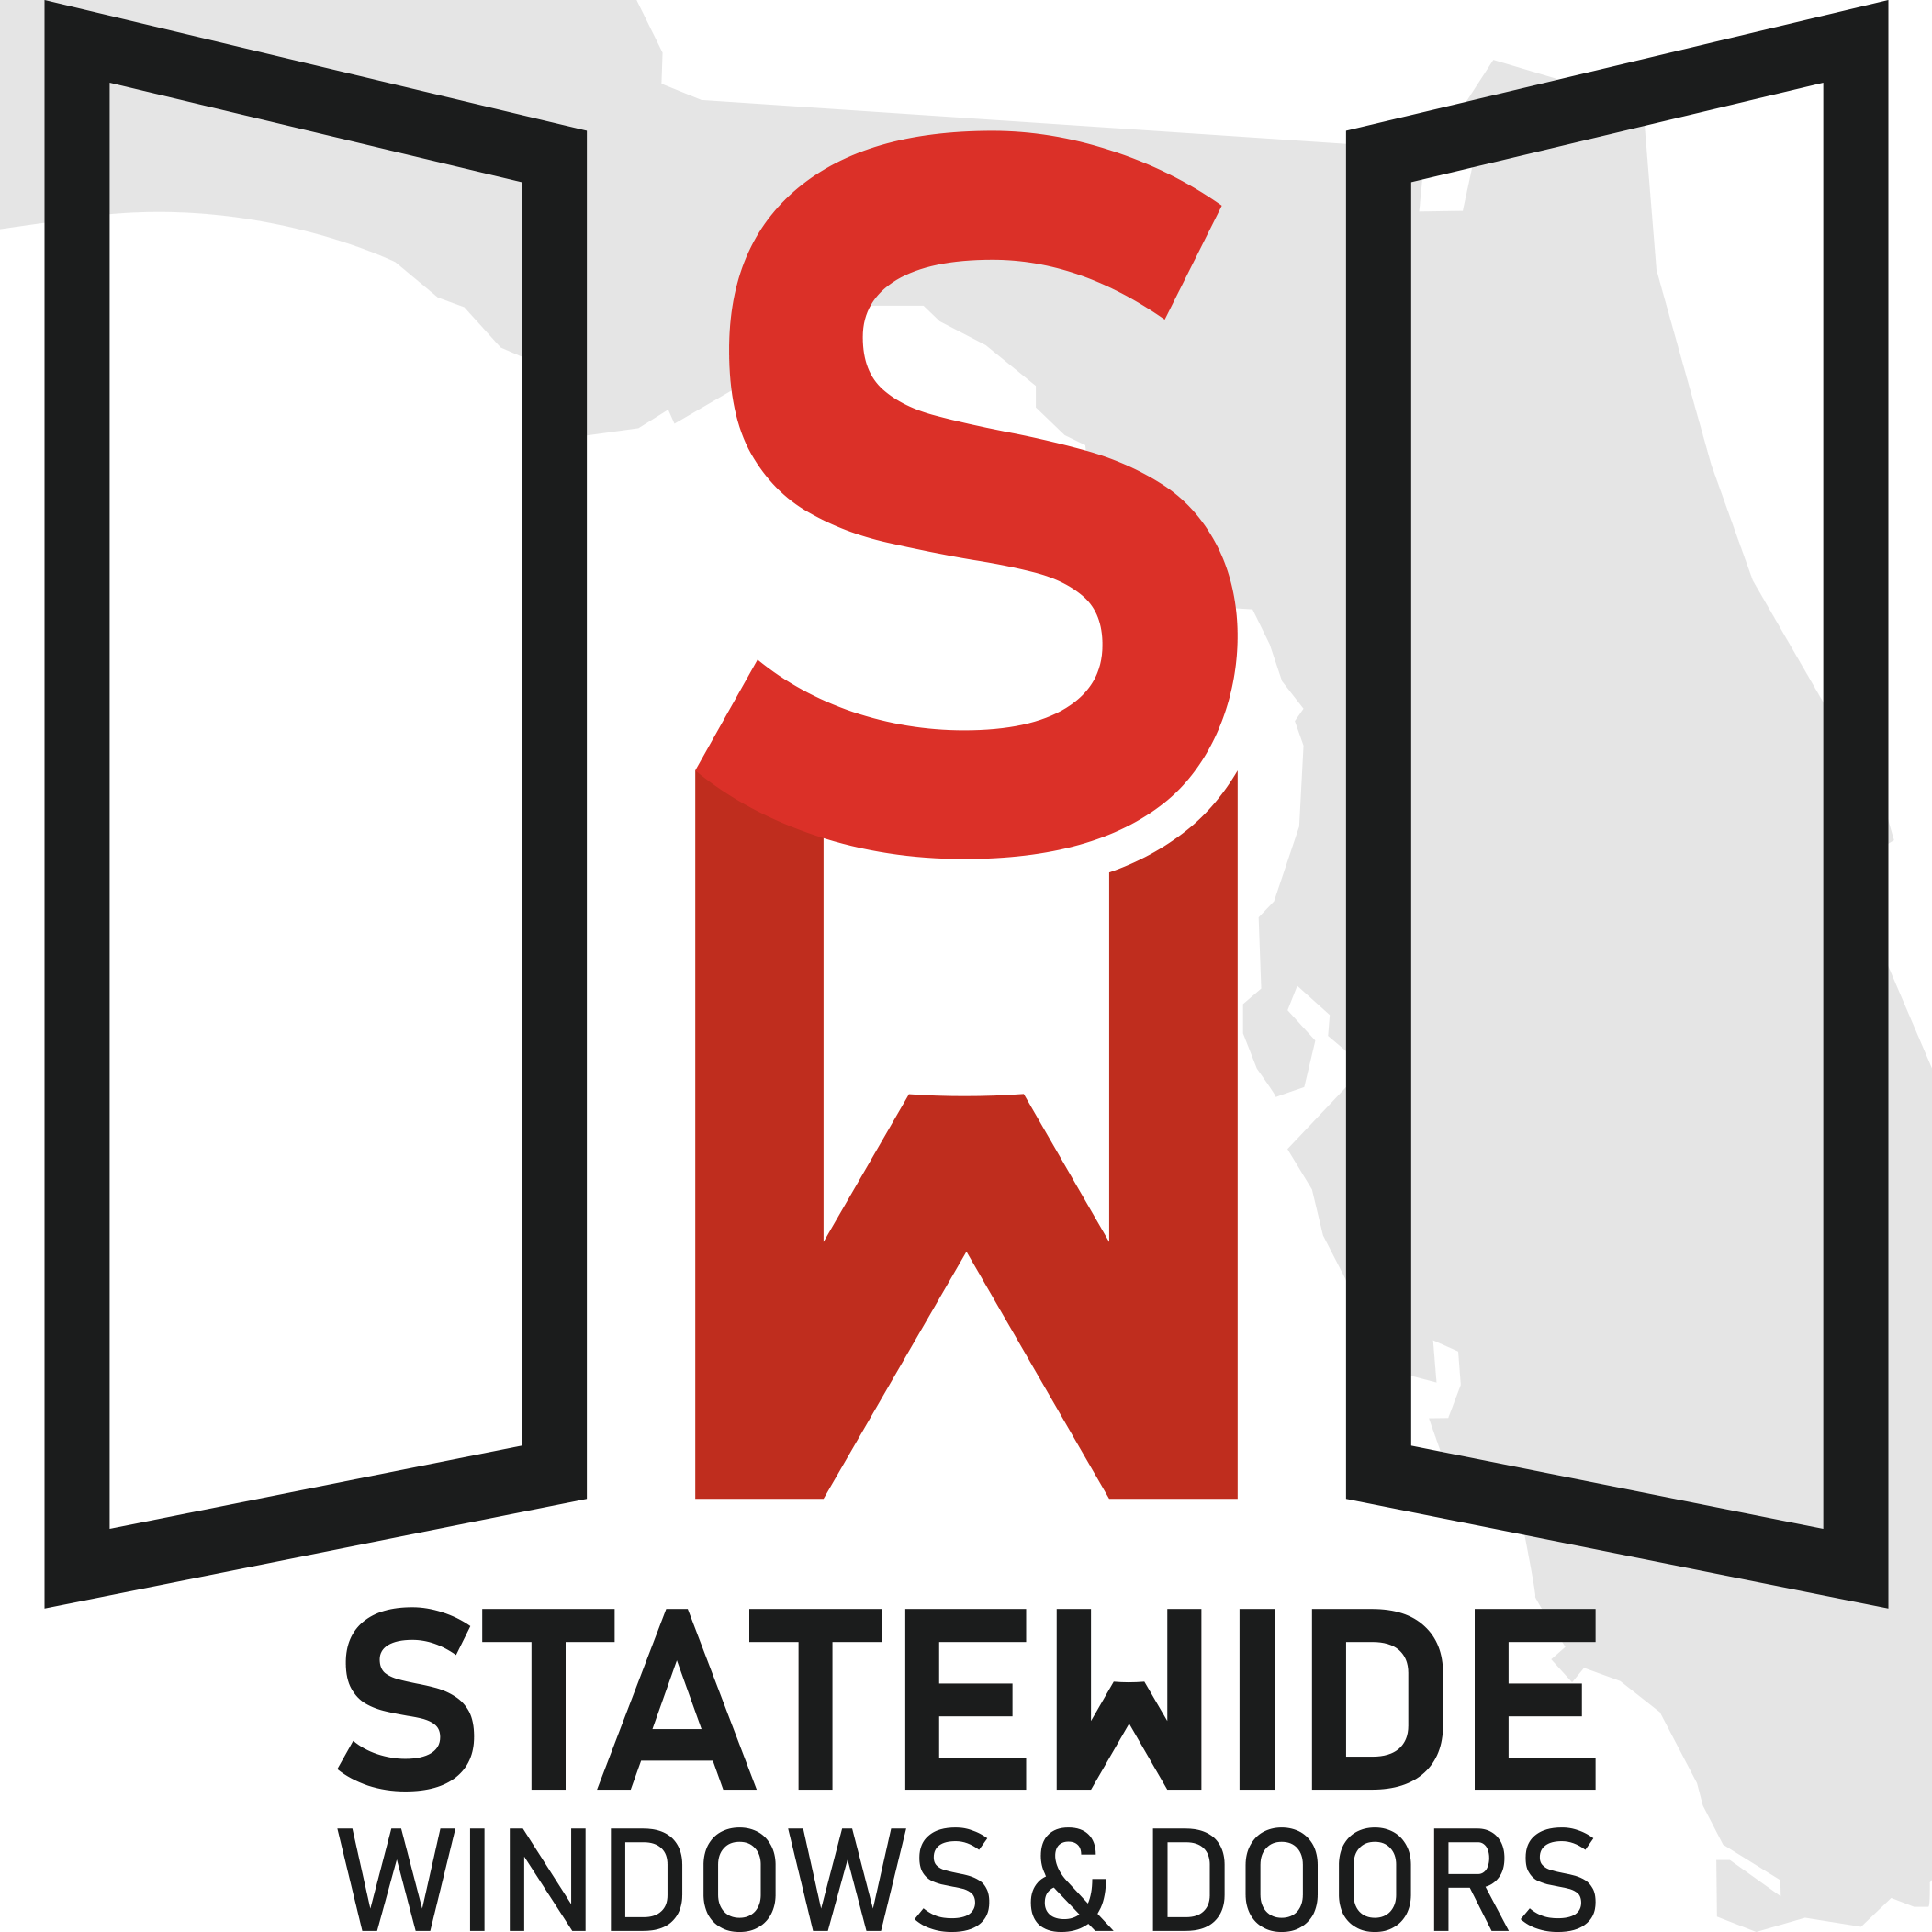 Statewide Windows & Doors